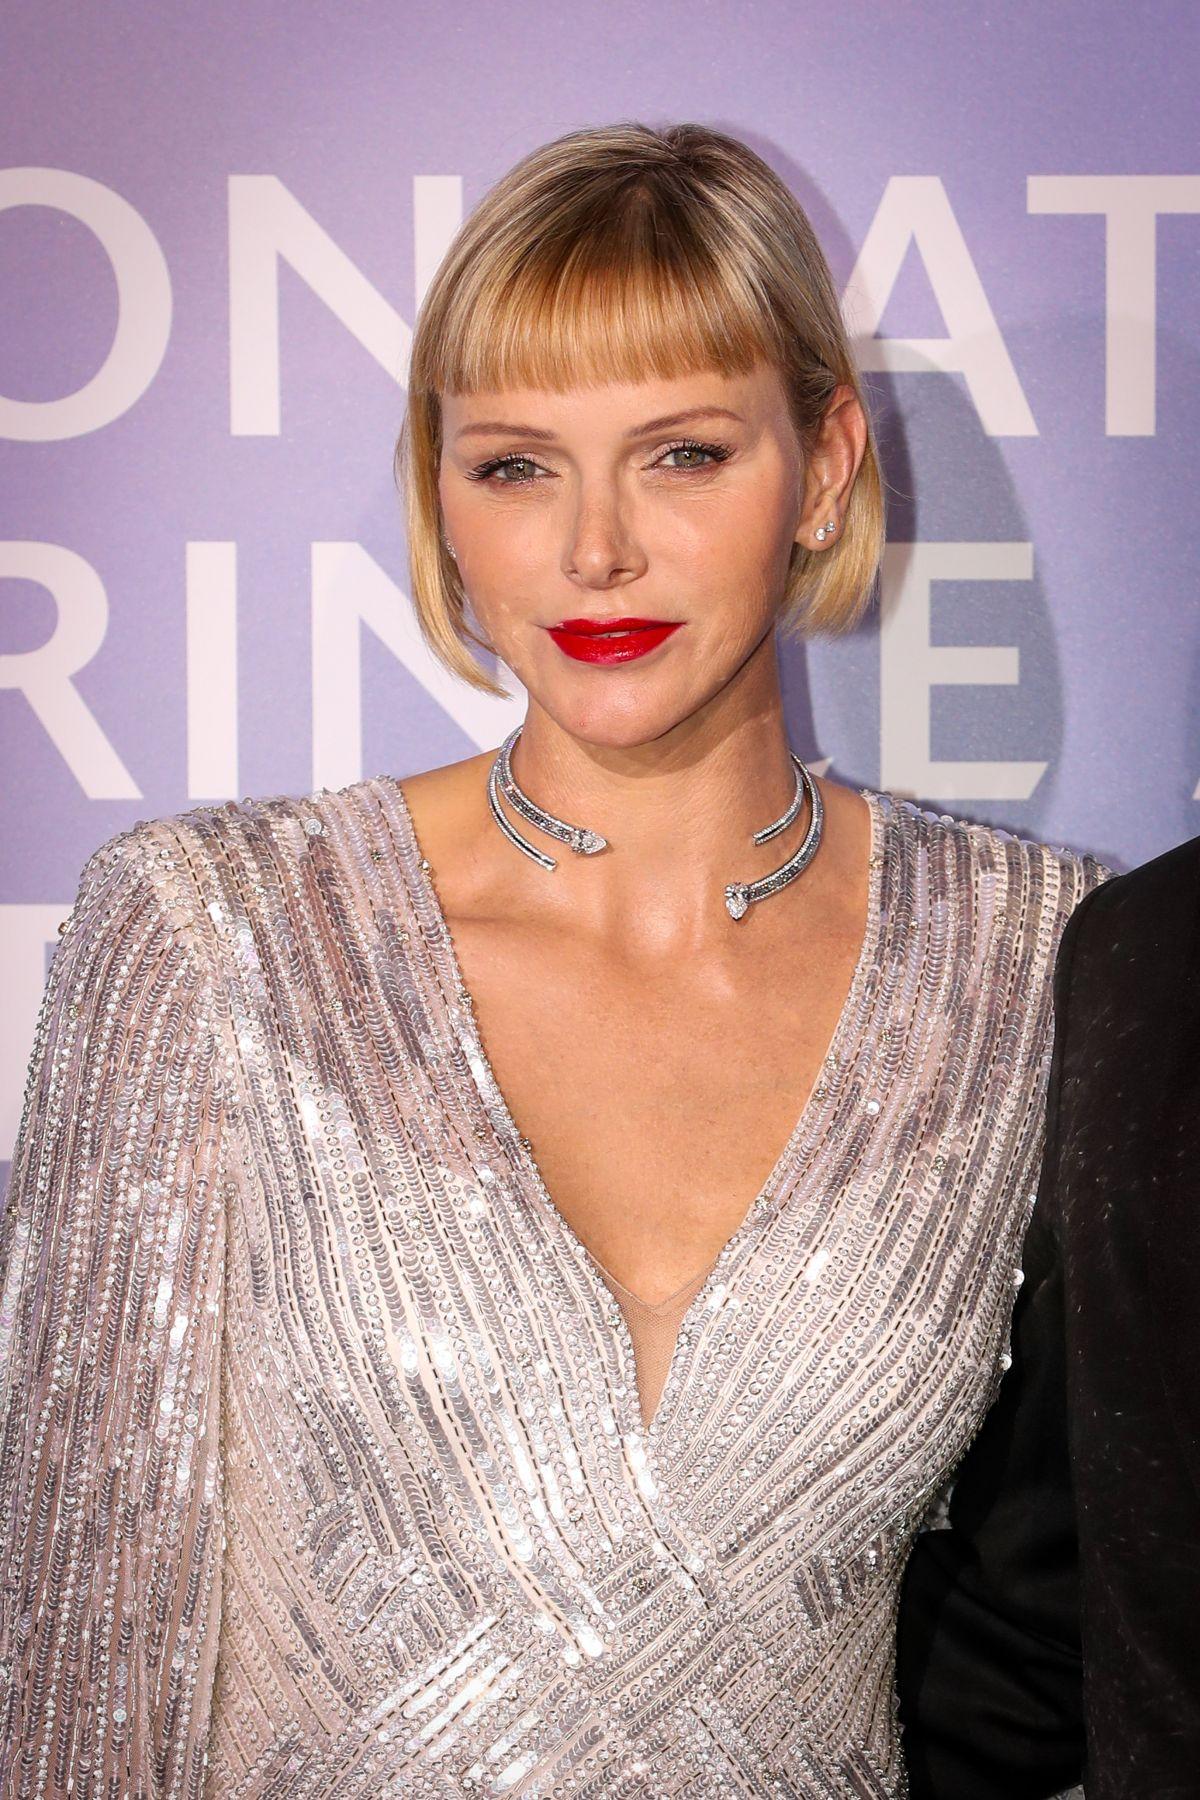 Charlene Monaco